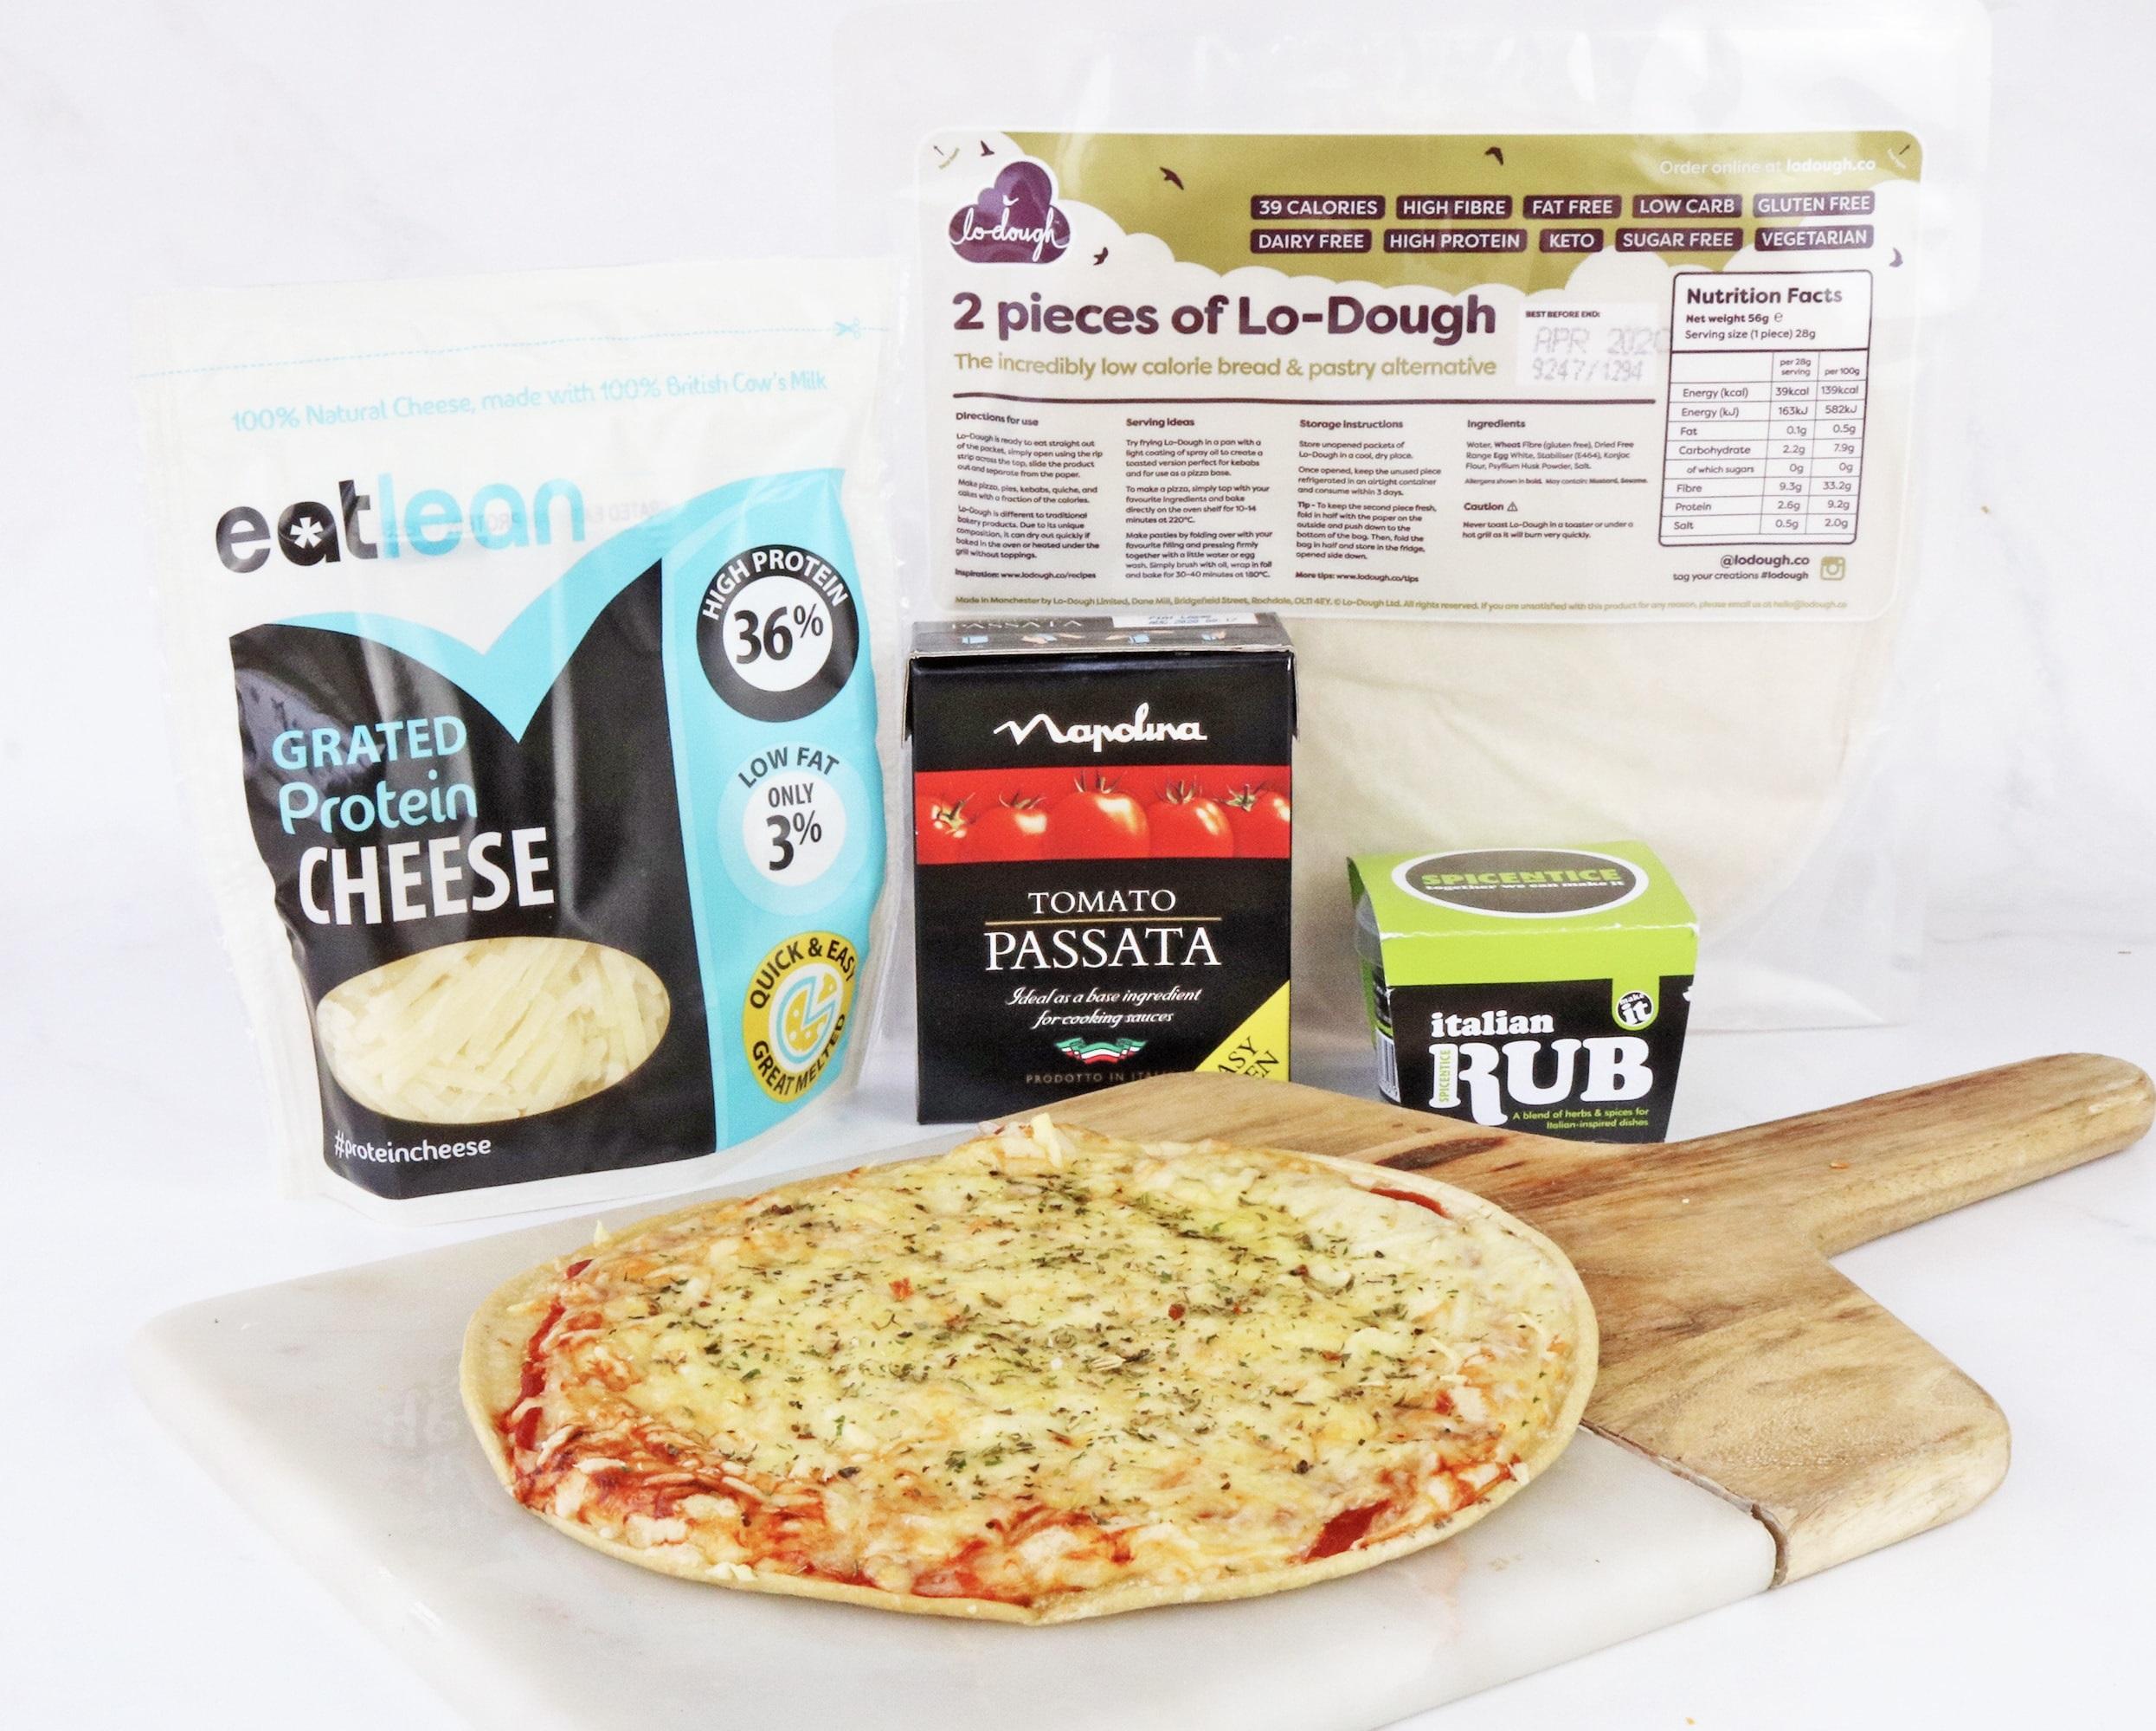 Low Calorie Pizza Kit 4 Pack